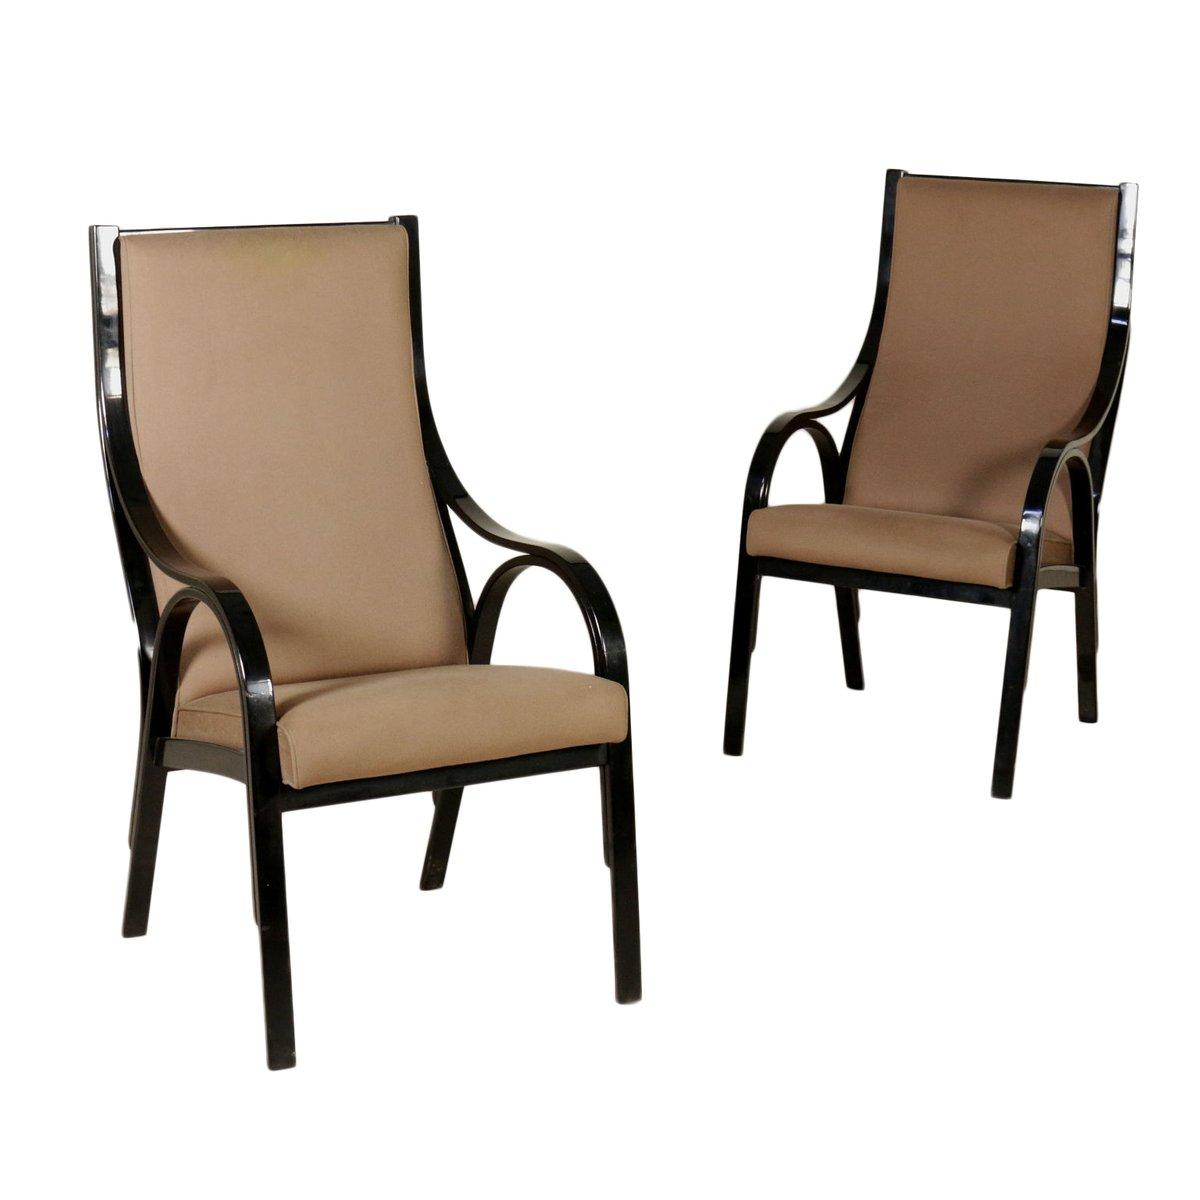 italienische cavour armlehnst hle von stoppino meneghetti. Black Bedroom Furniture Sets. Home Design Ideas